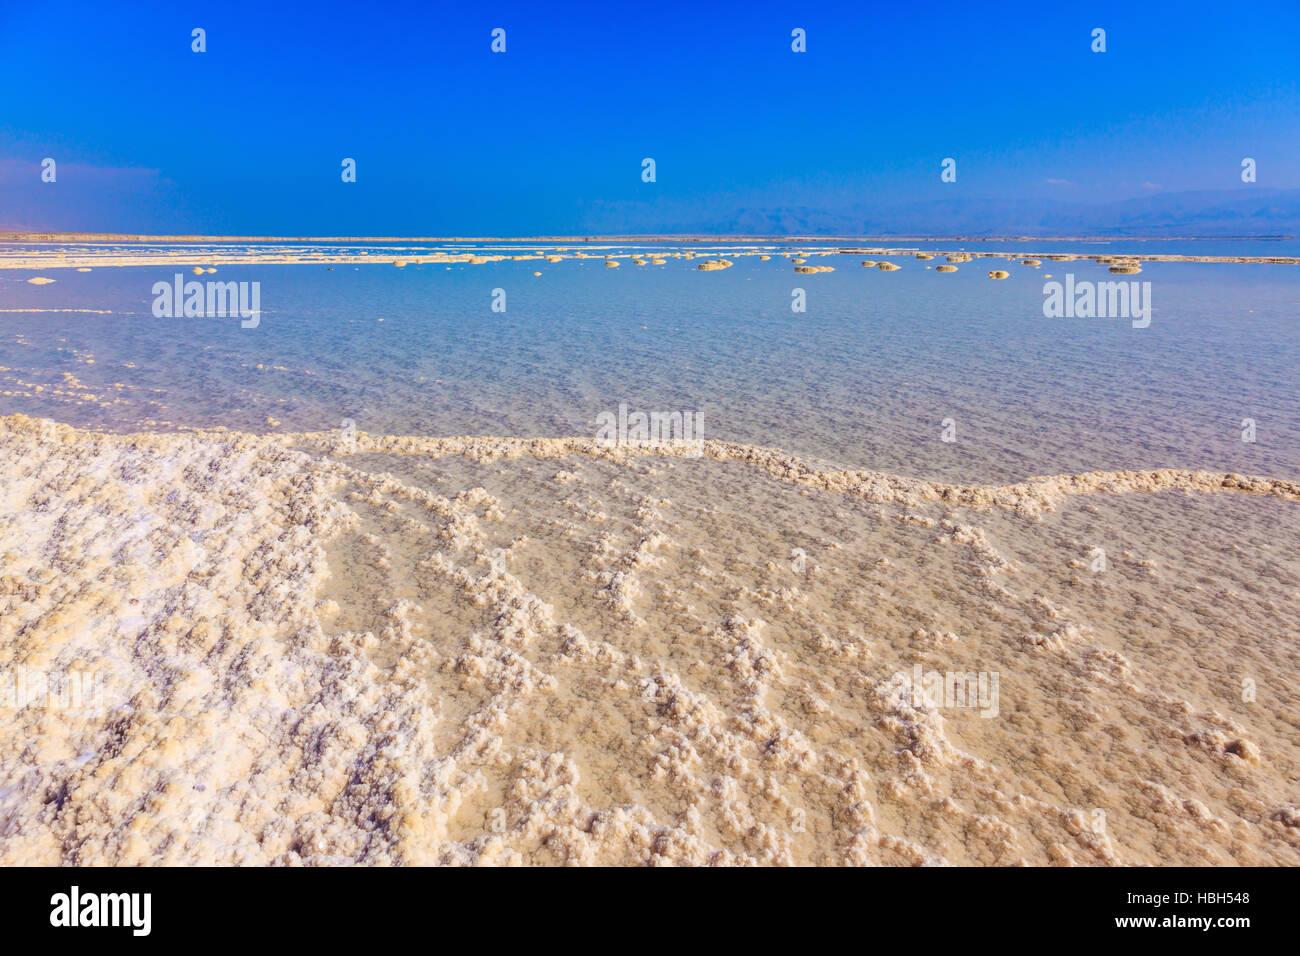 Vaporized salt - Stock Image